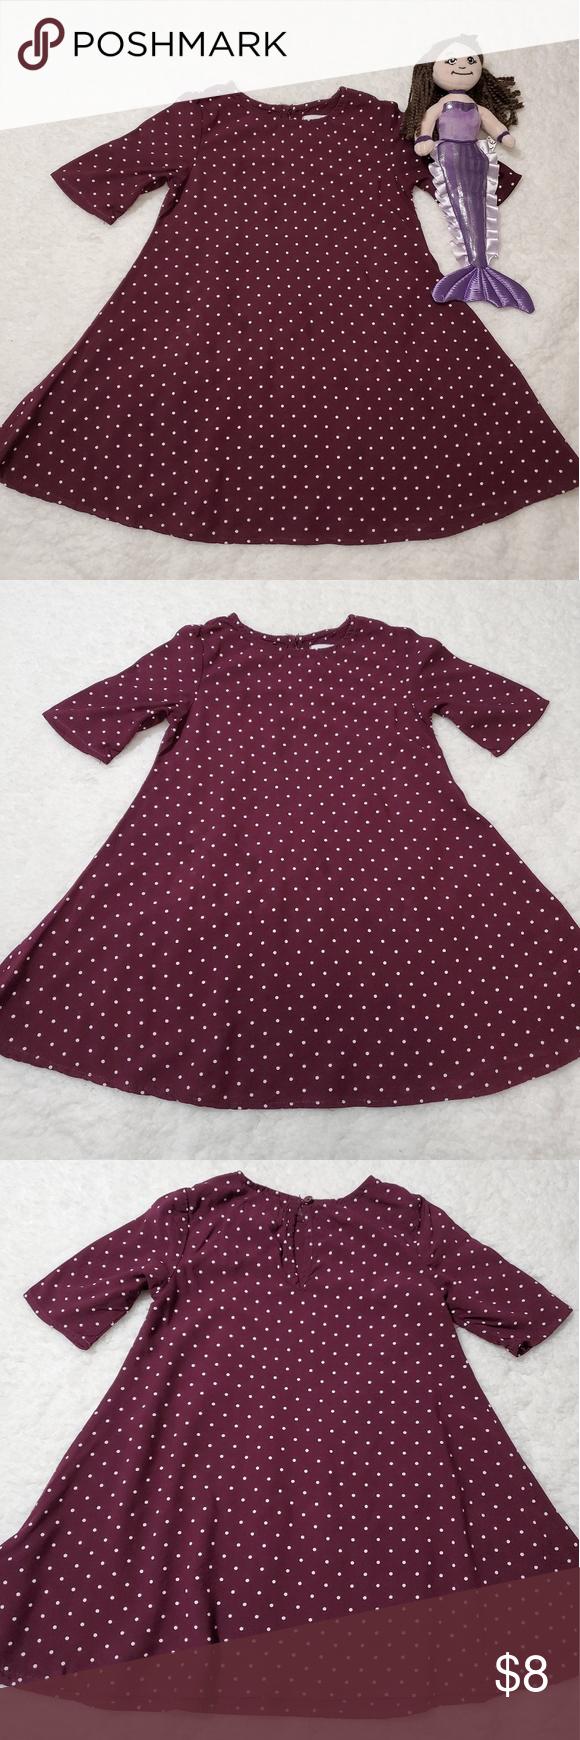 Old Navy Toddler Girls Purple Dress 4t Purple Girls Dress Old Navy Toddler Girl Purple Swing Dress [ 1740 x 580 Pixel ]